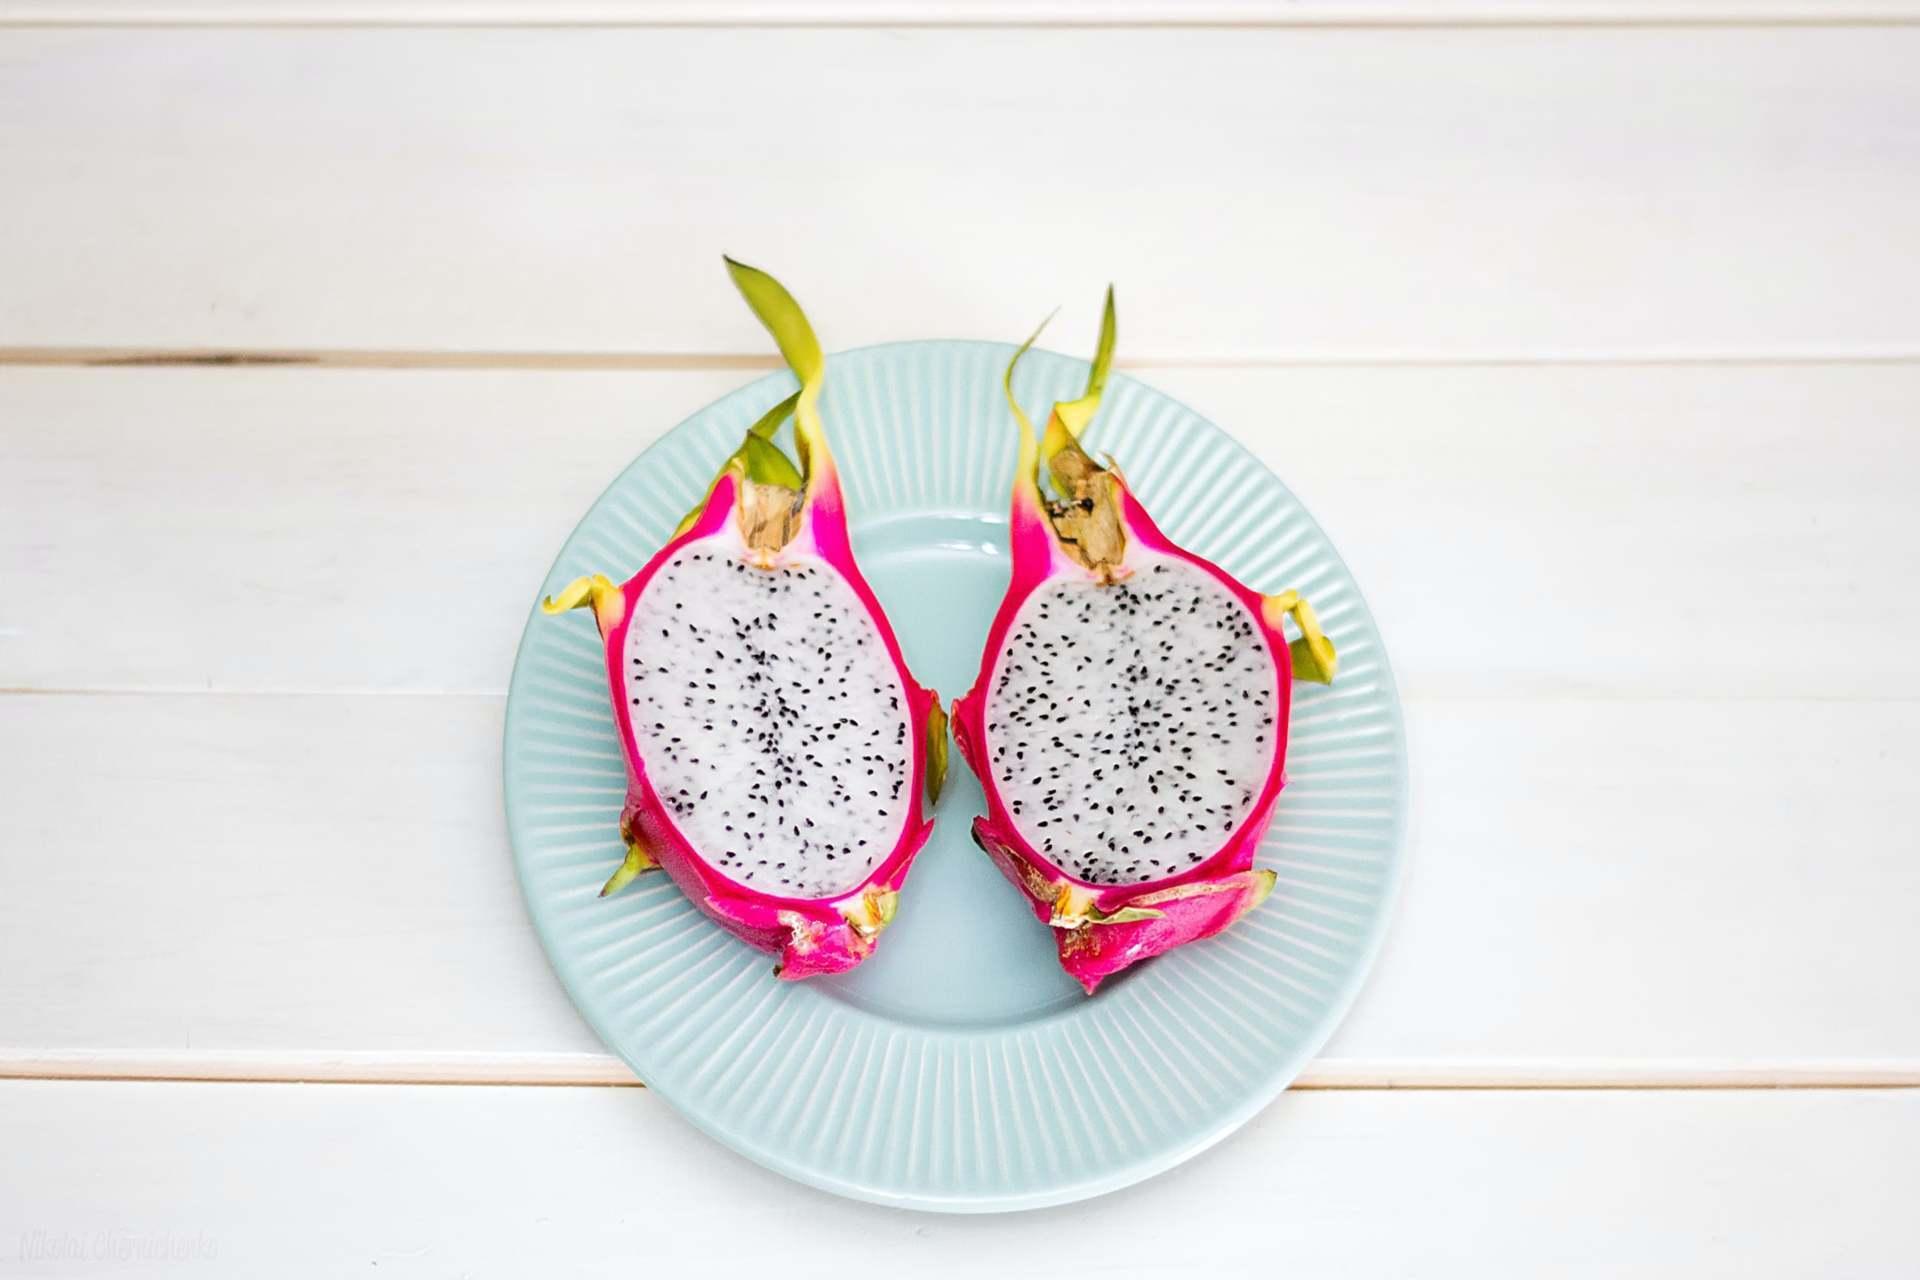 health benefits of dragon fruit